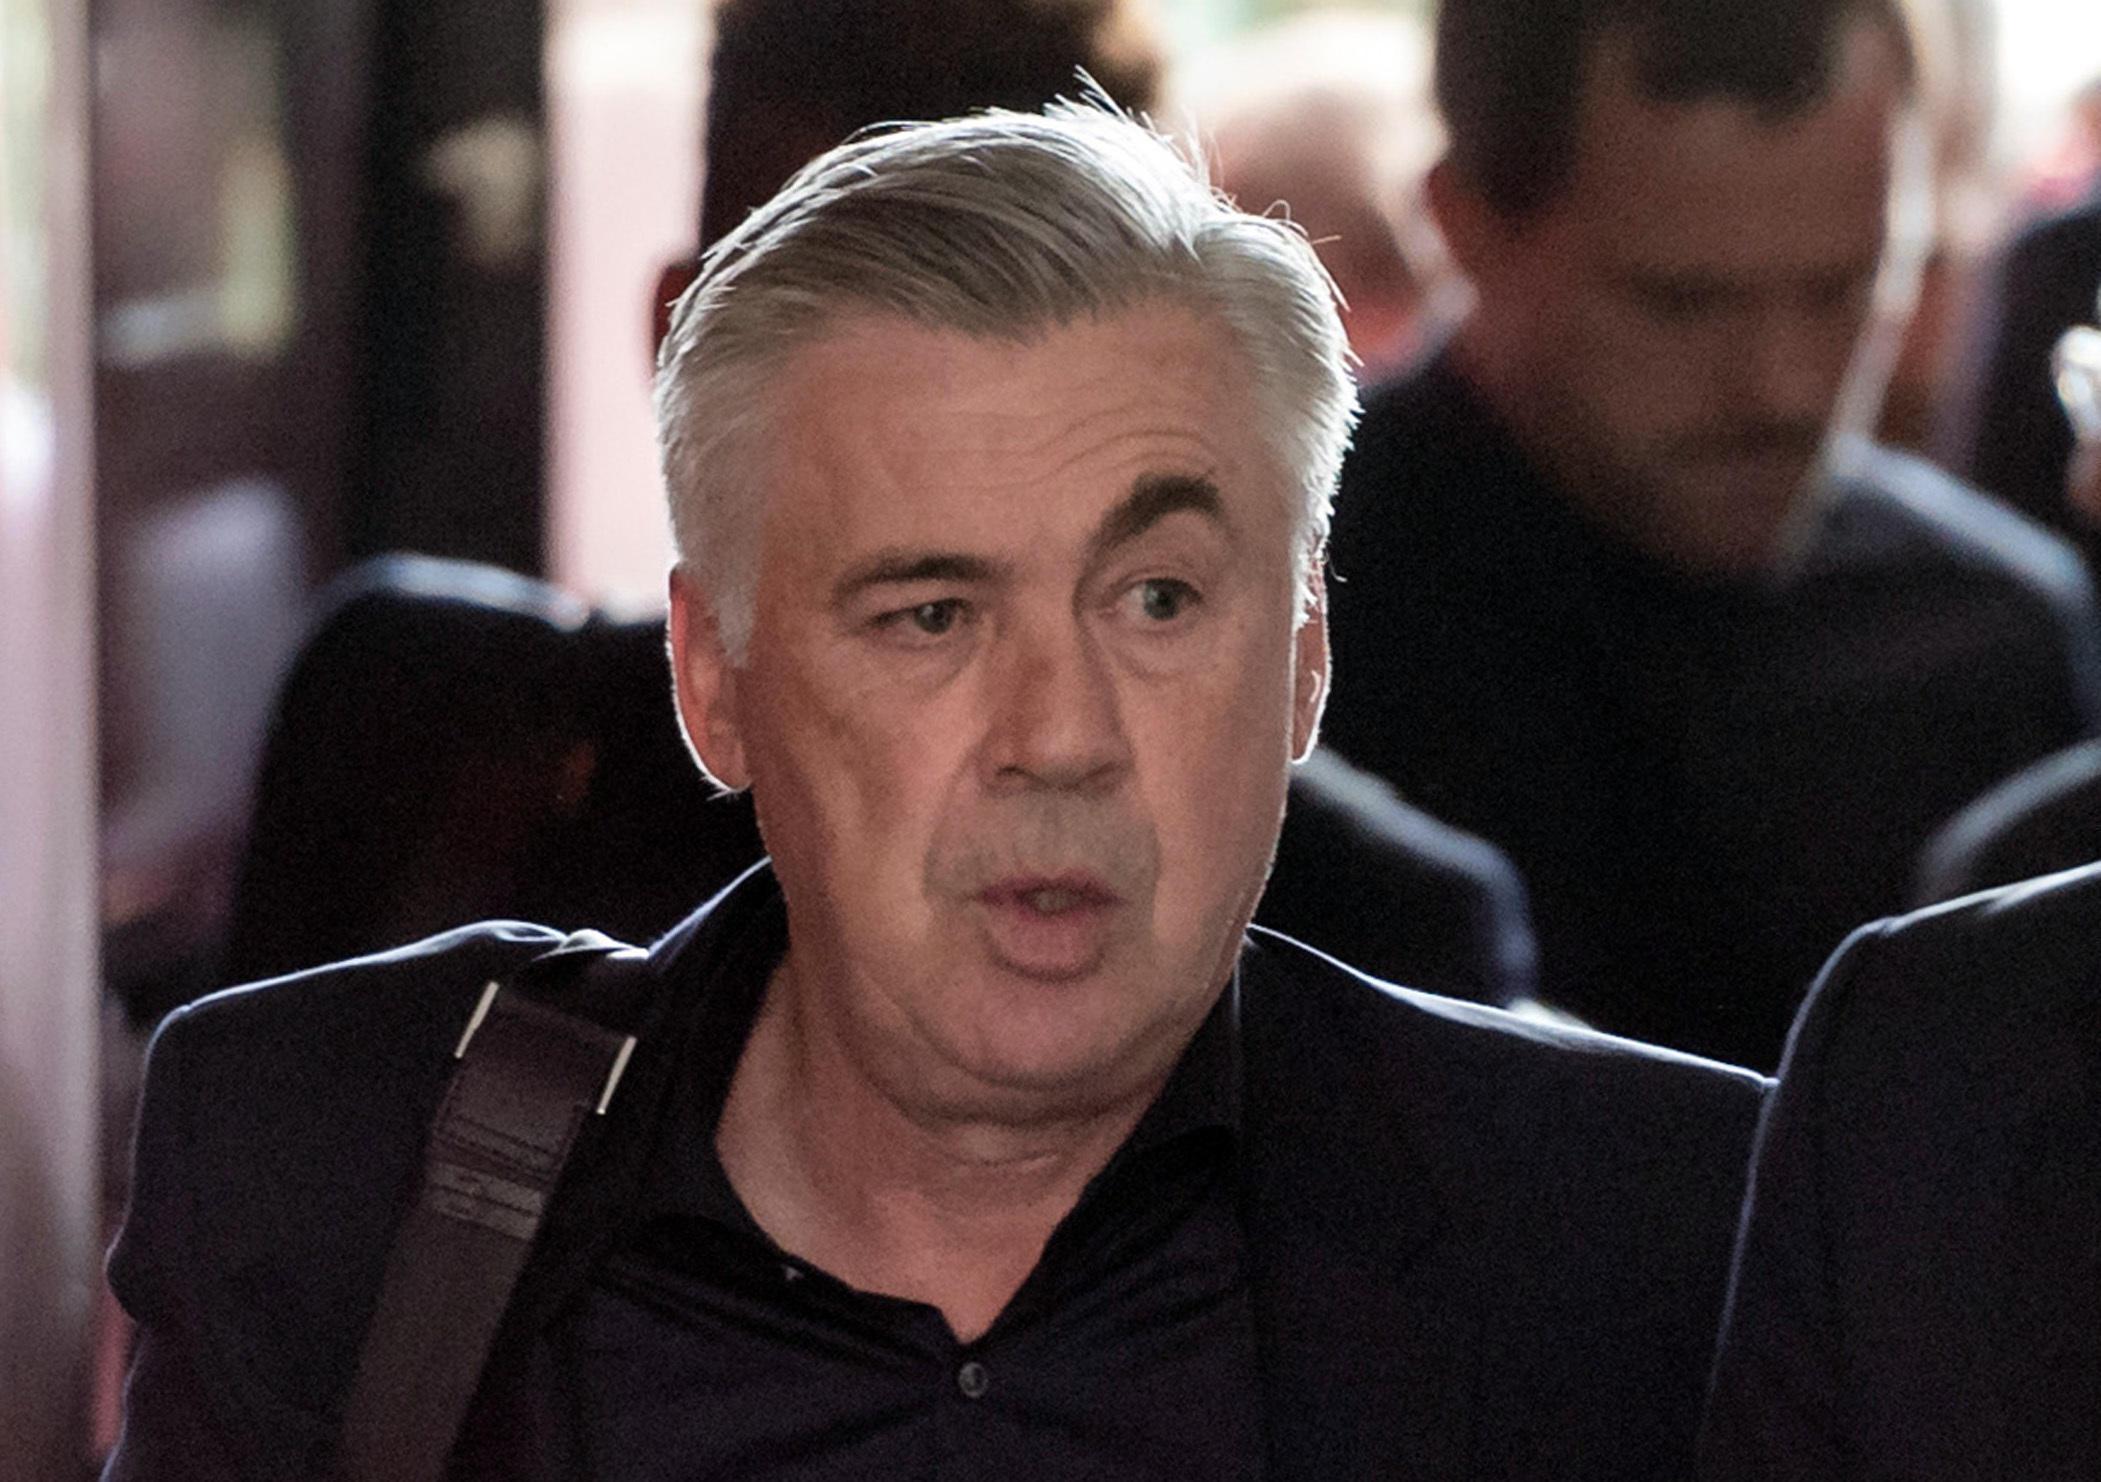 Carlo Ancelotti was sacked by Bayern Munich last week following PSG drubbing